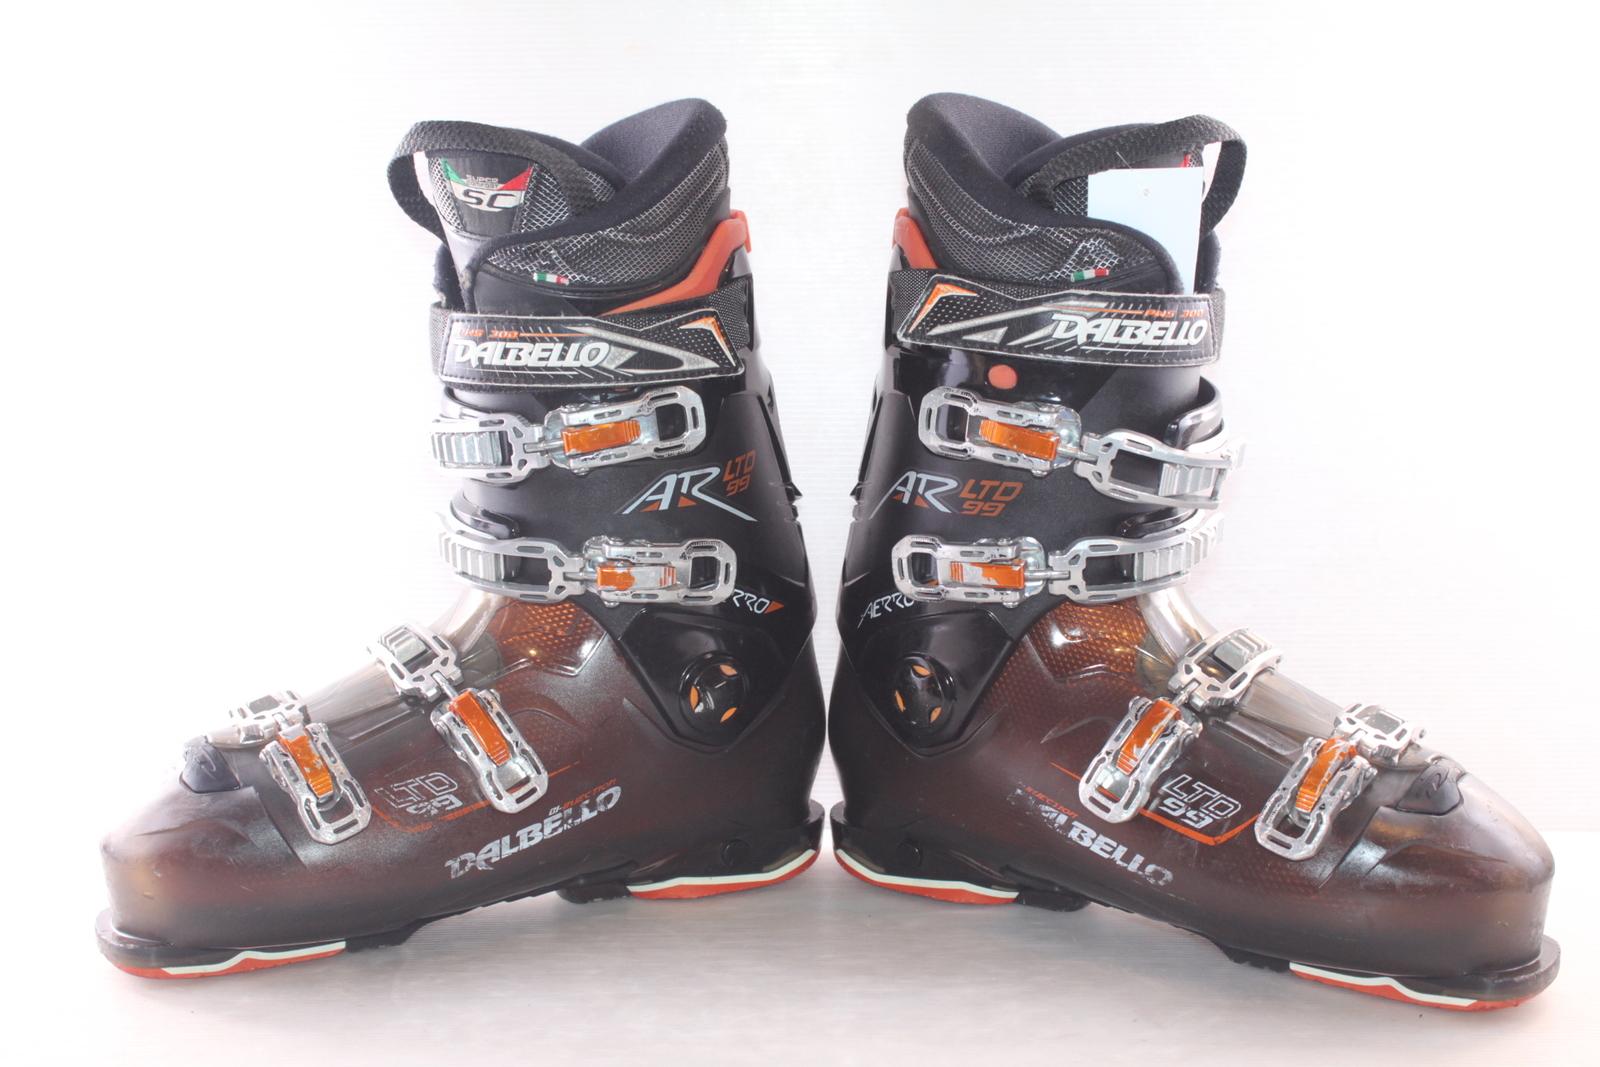 Lyžařské boty Dalbello Aerro LTD 99 vel. EU46.5 flexe 90